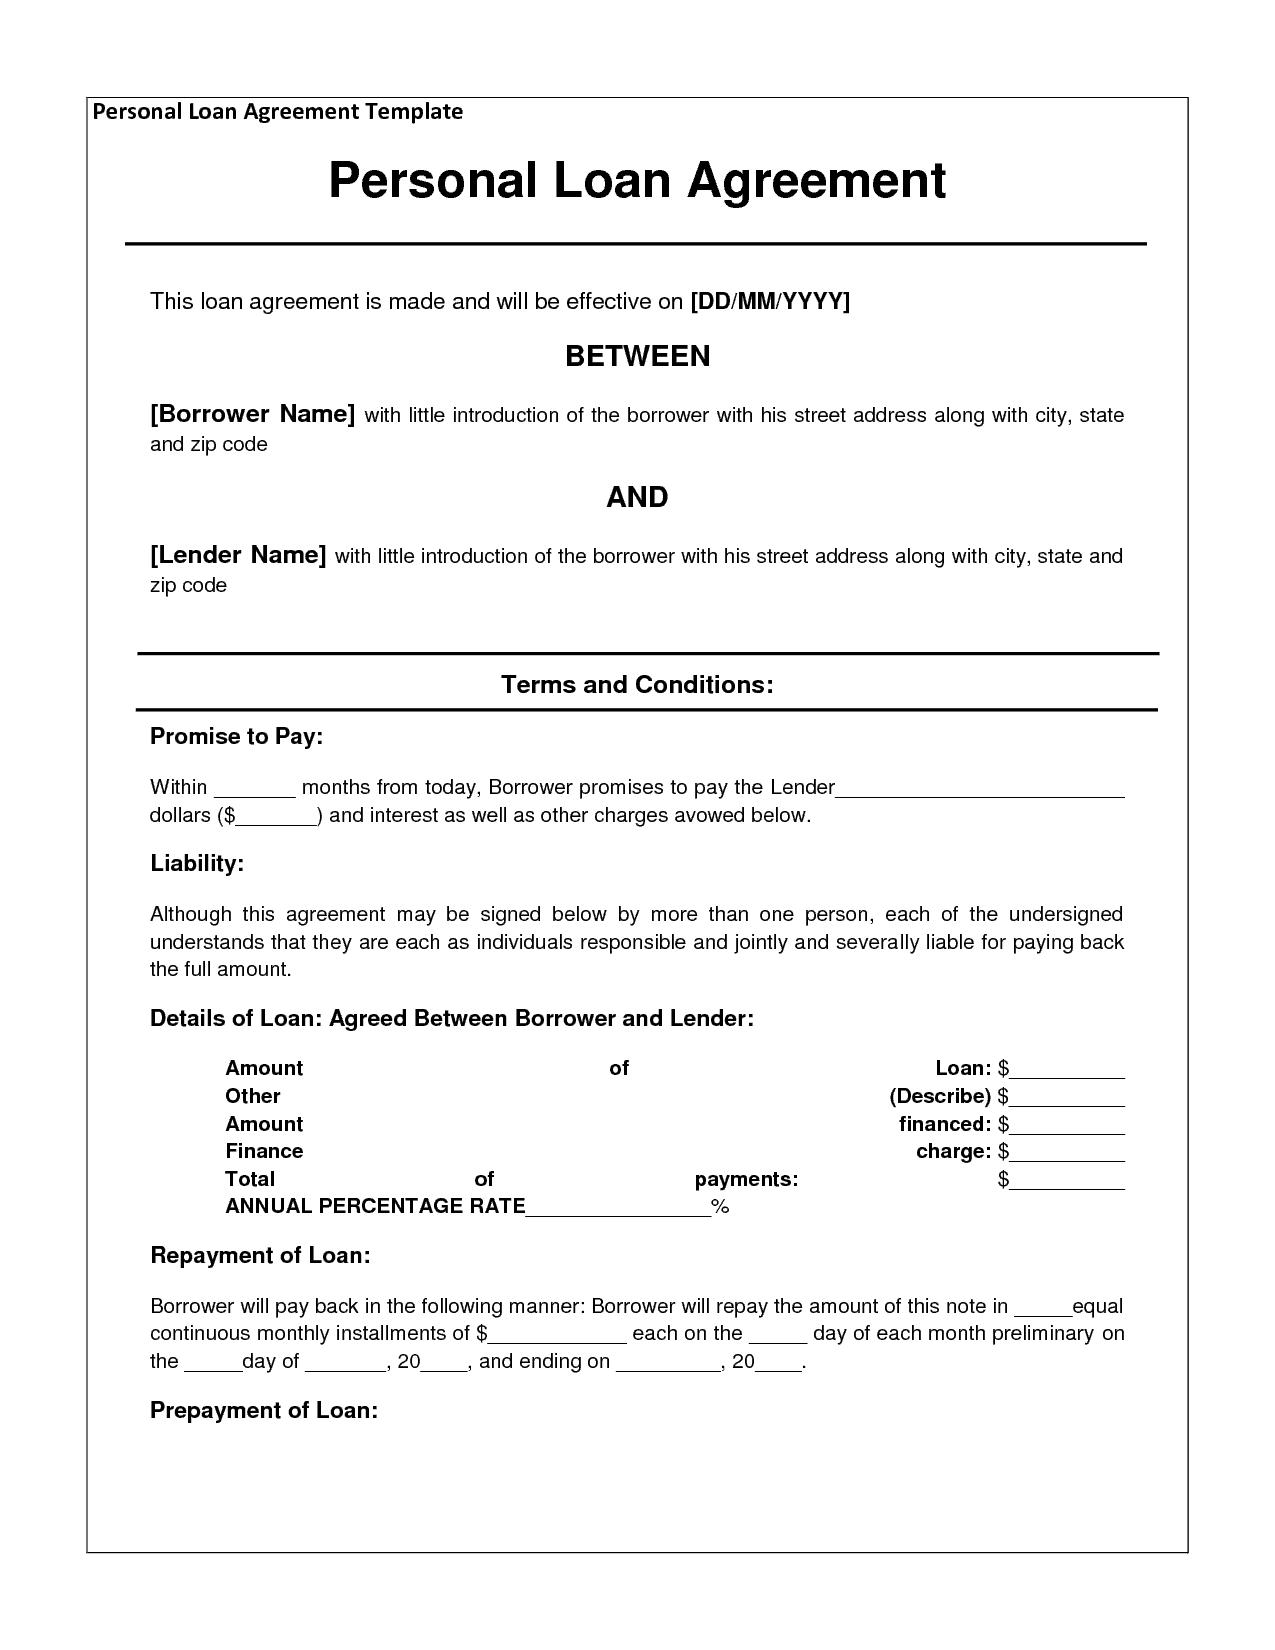 Loan Agreement Template 1441  Loan Agreement Draft